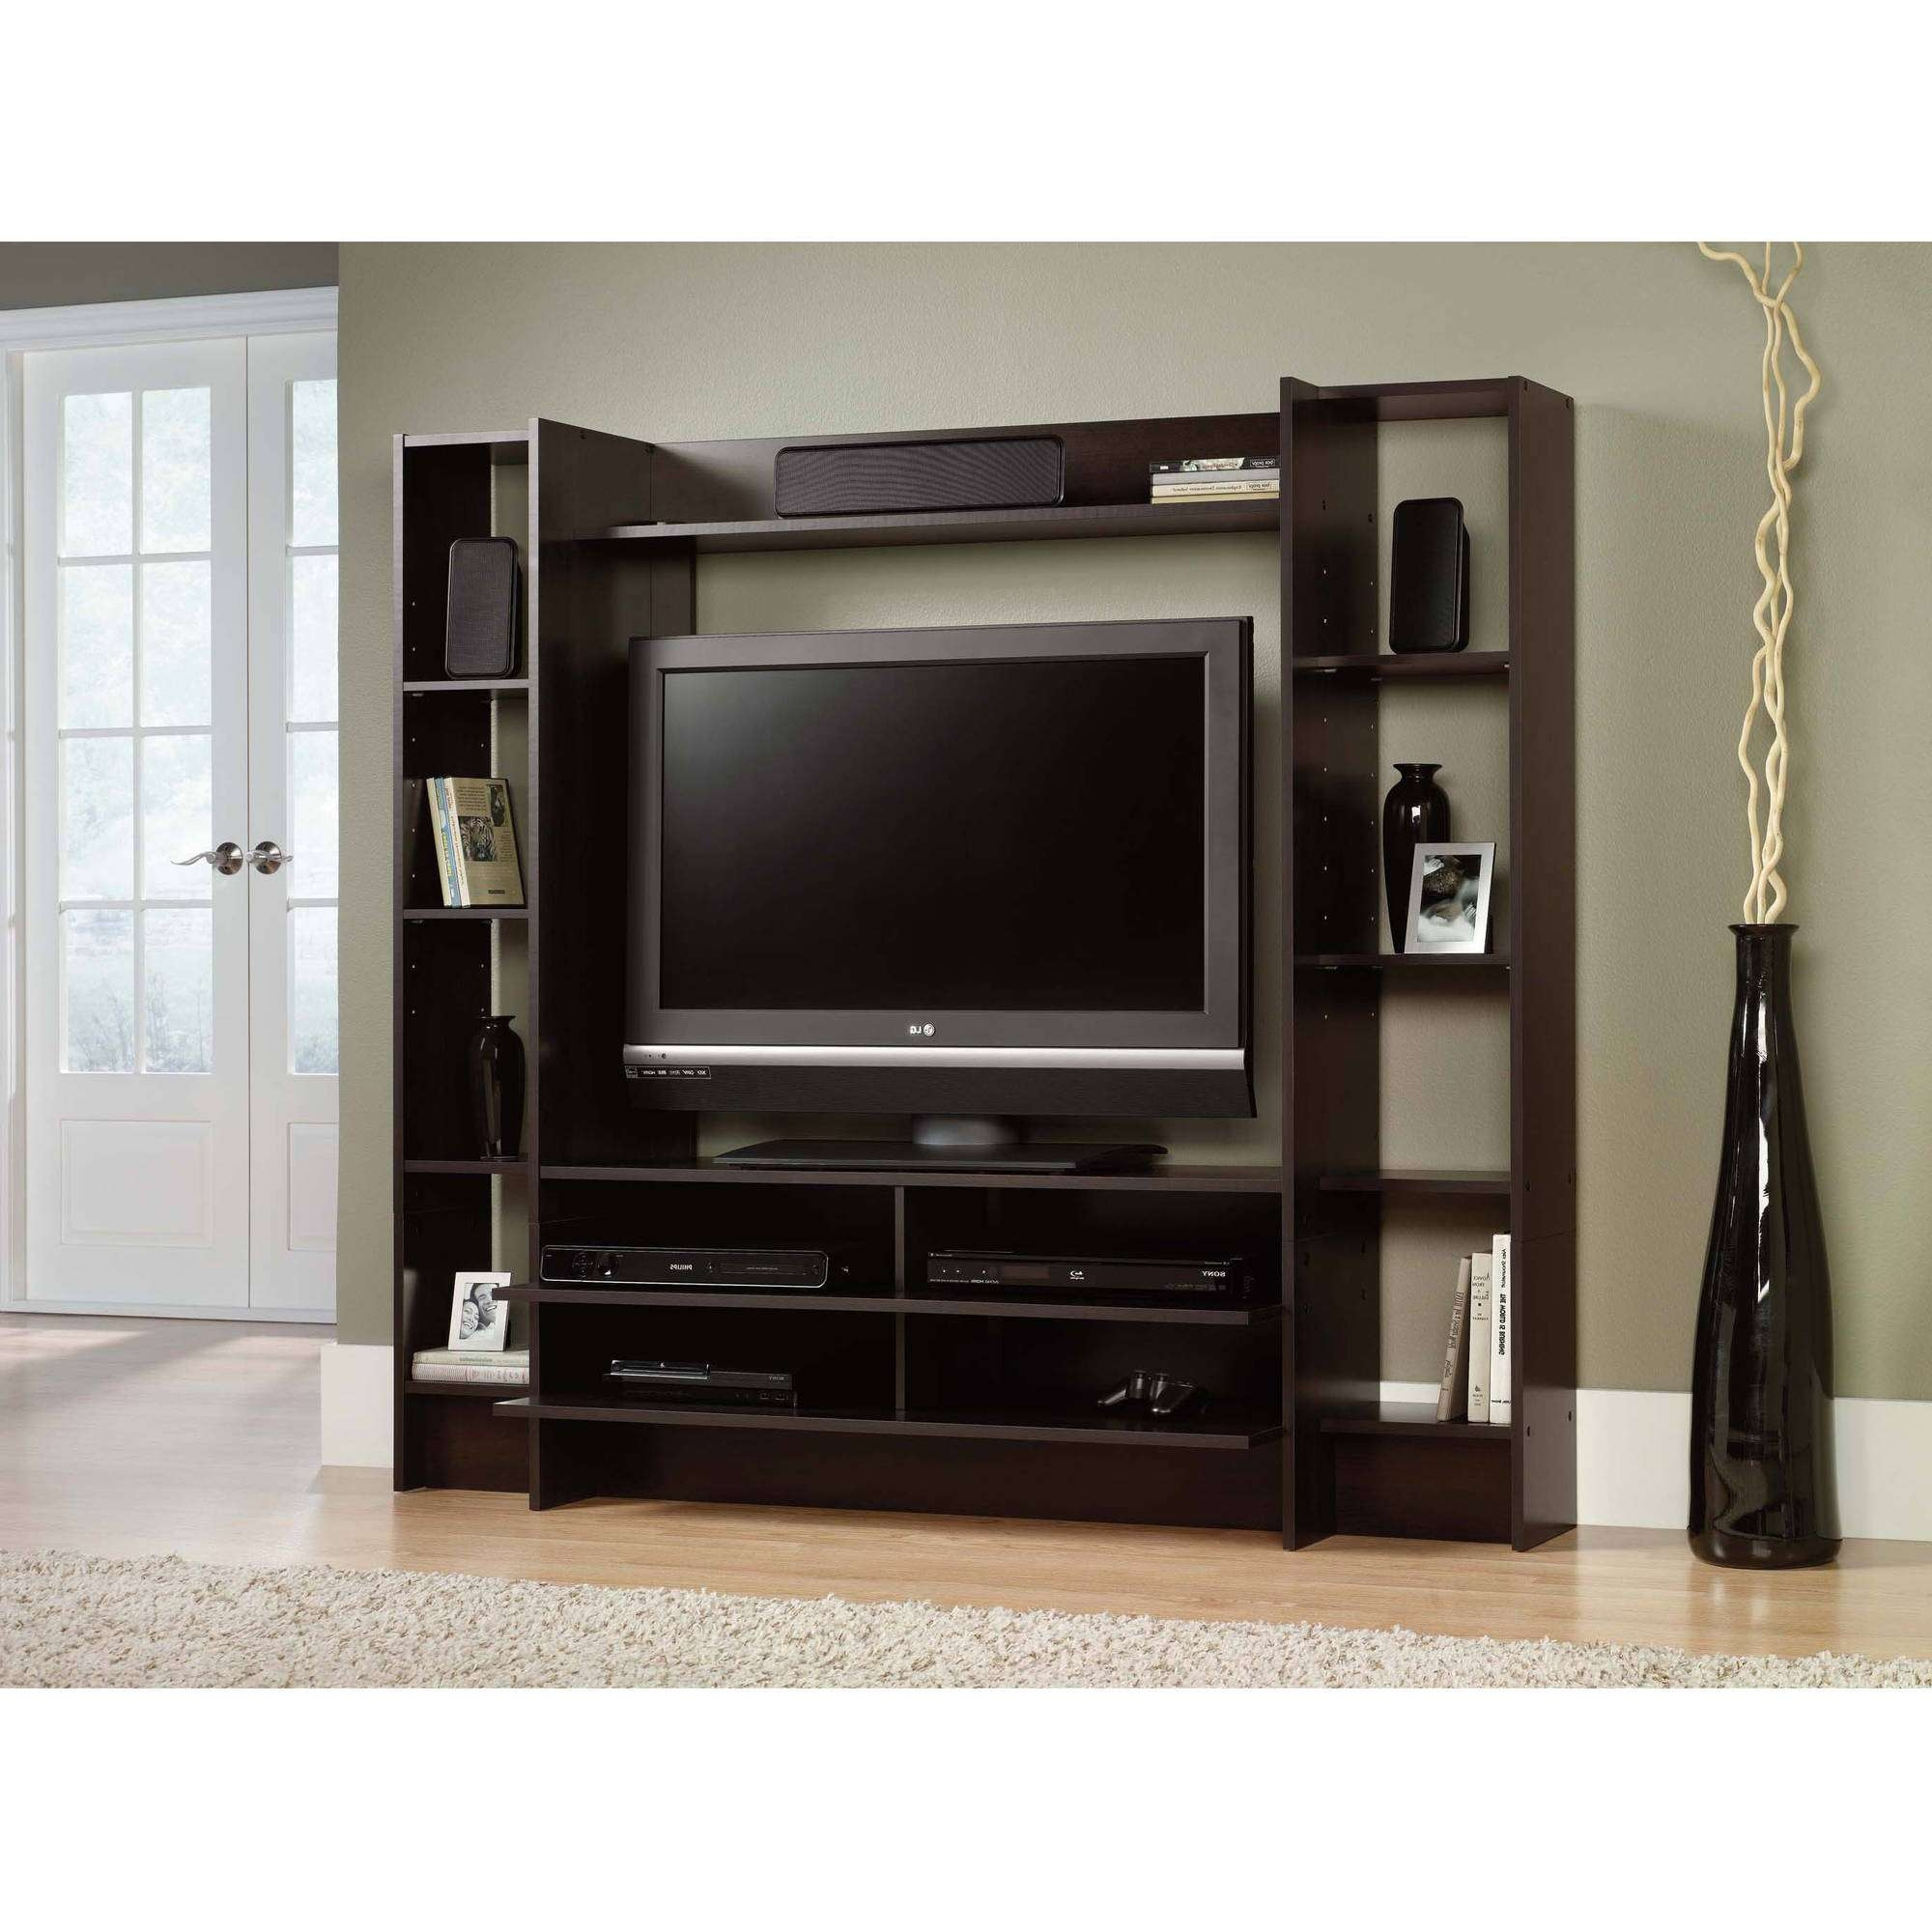 Tv Stands & Entertainment Centers – Walmart Inside Entertainment Center Tv Stands (View 4 of 15)